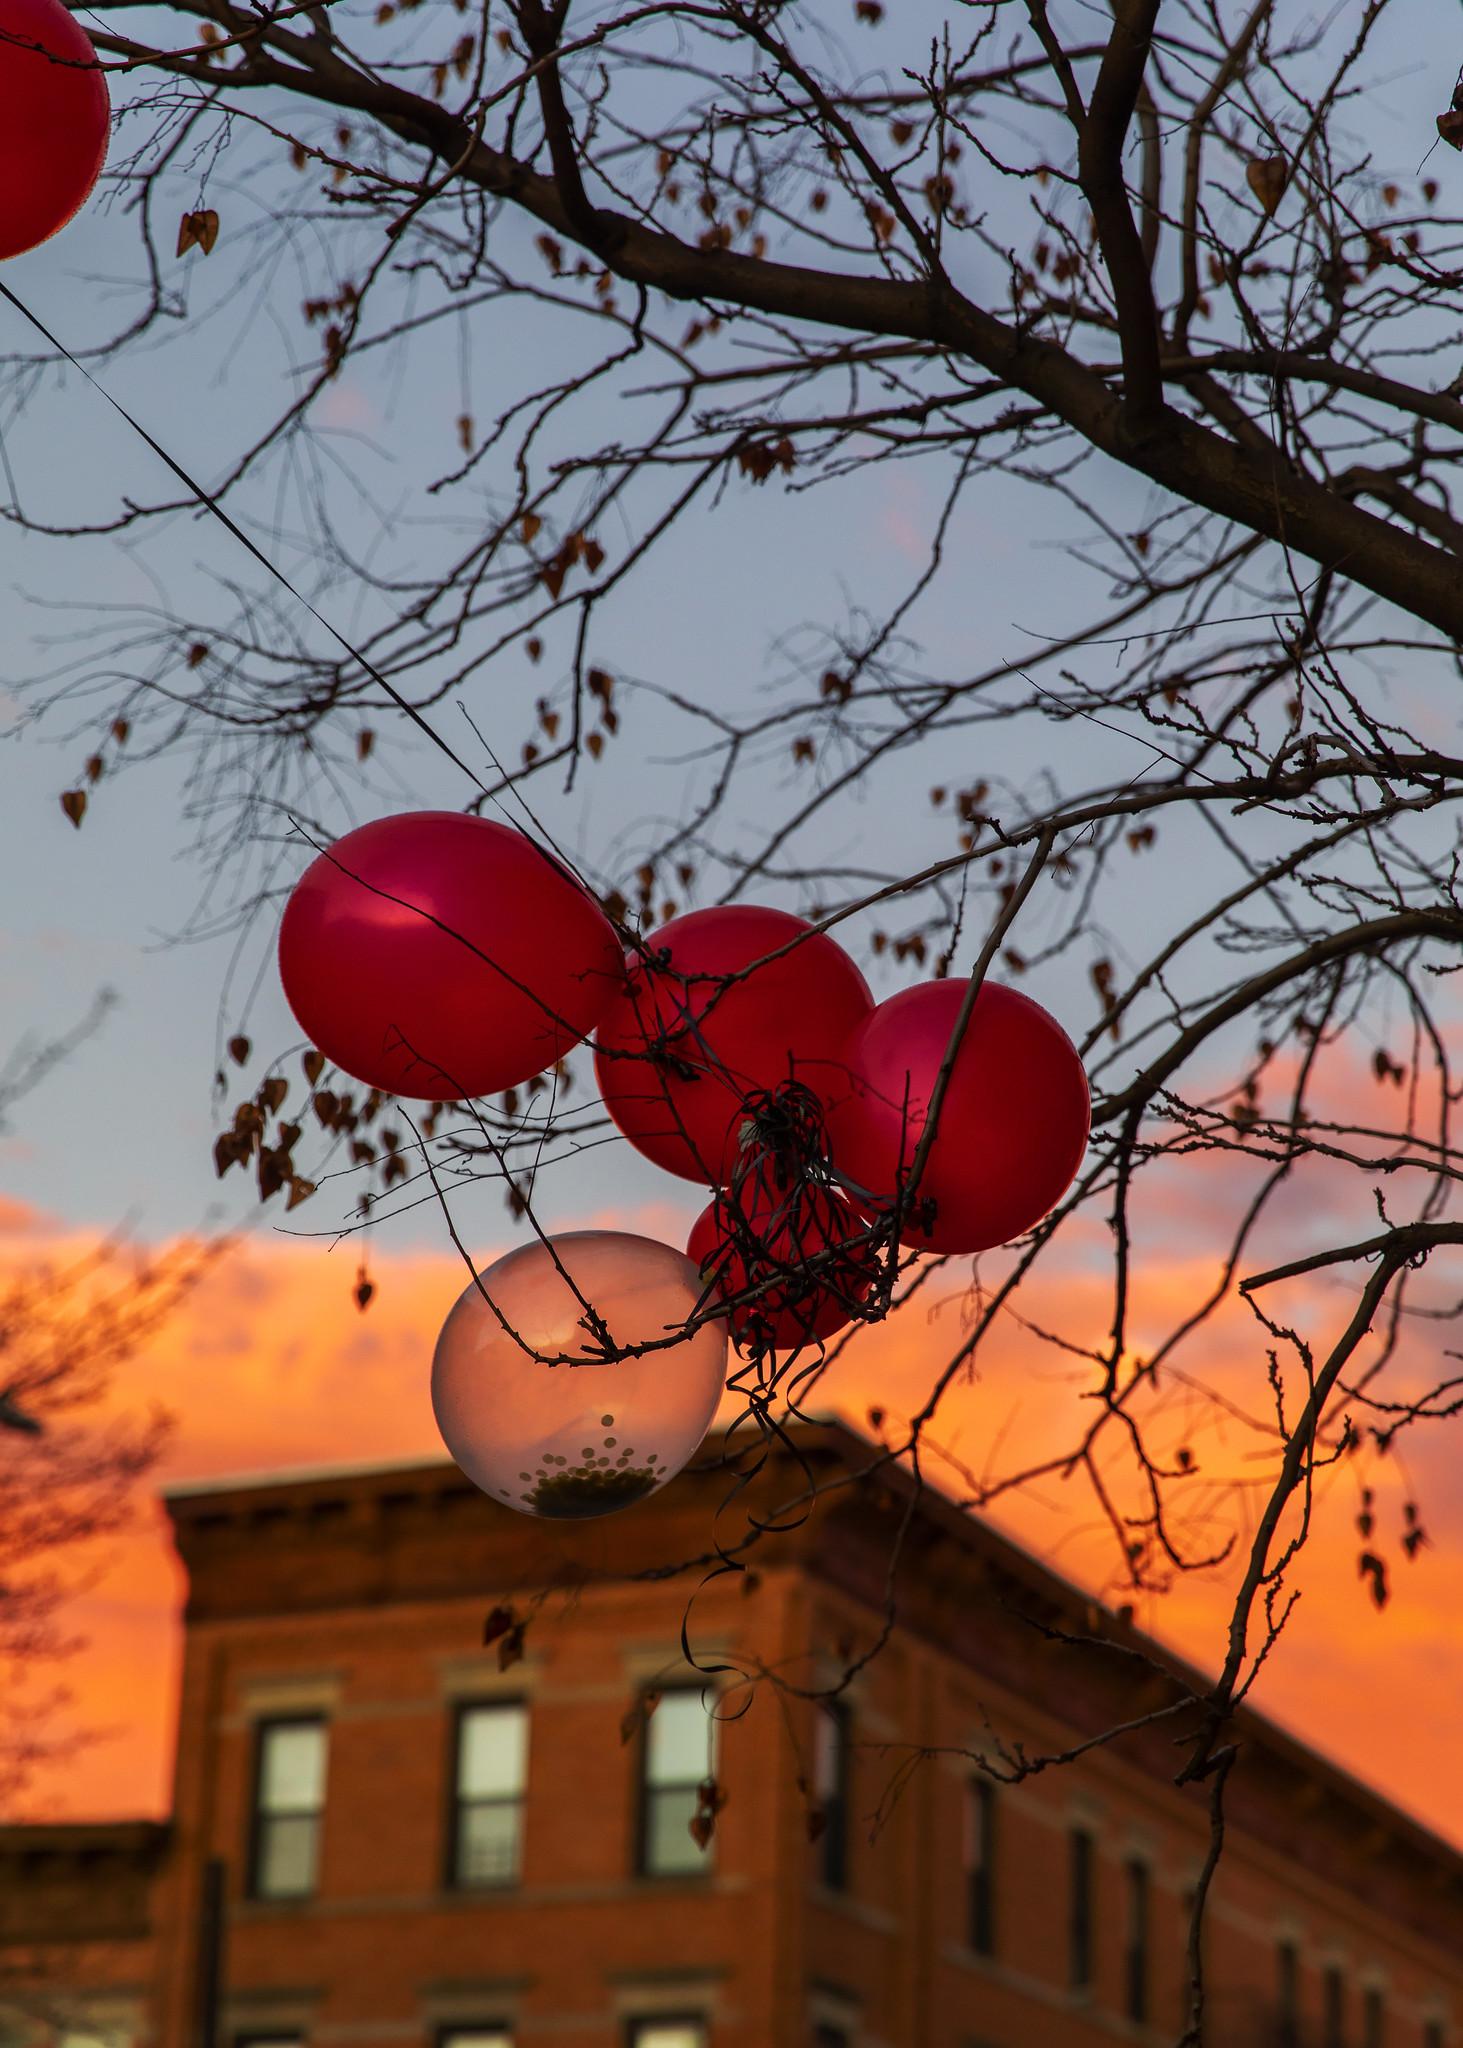 BalloonsSky.jpg